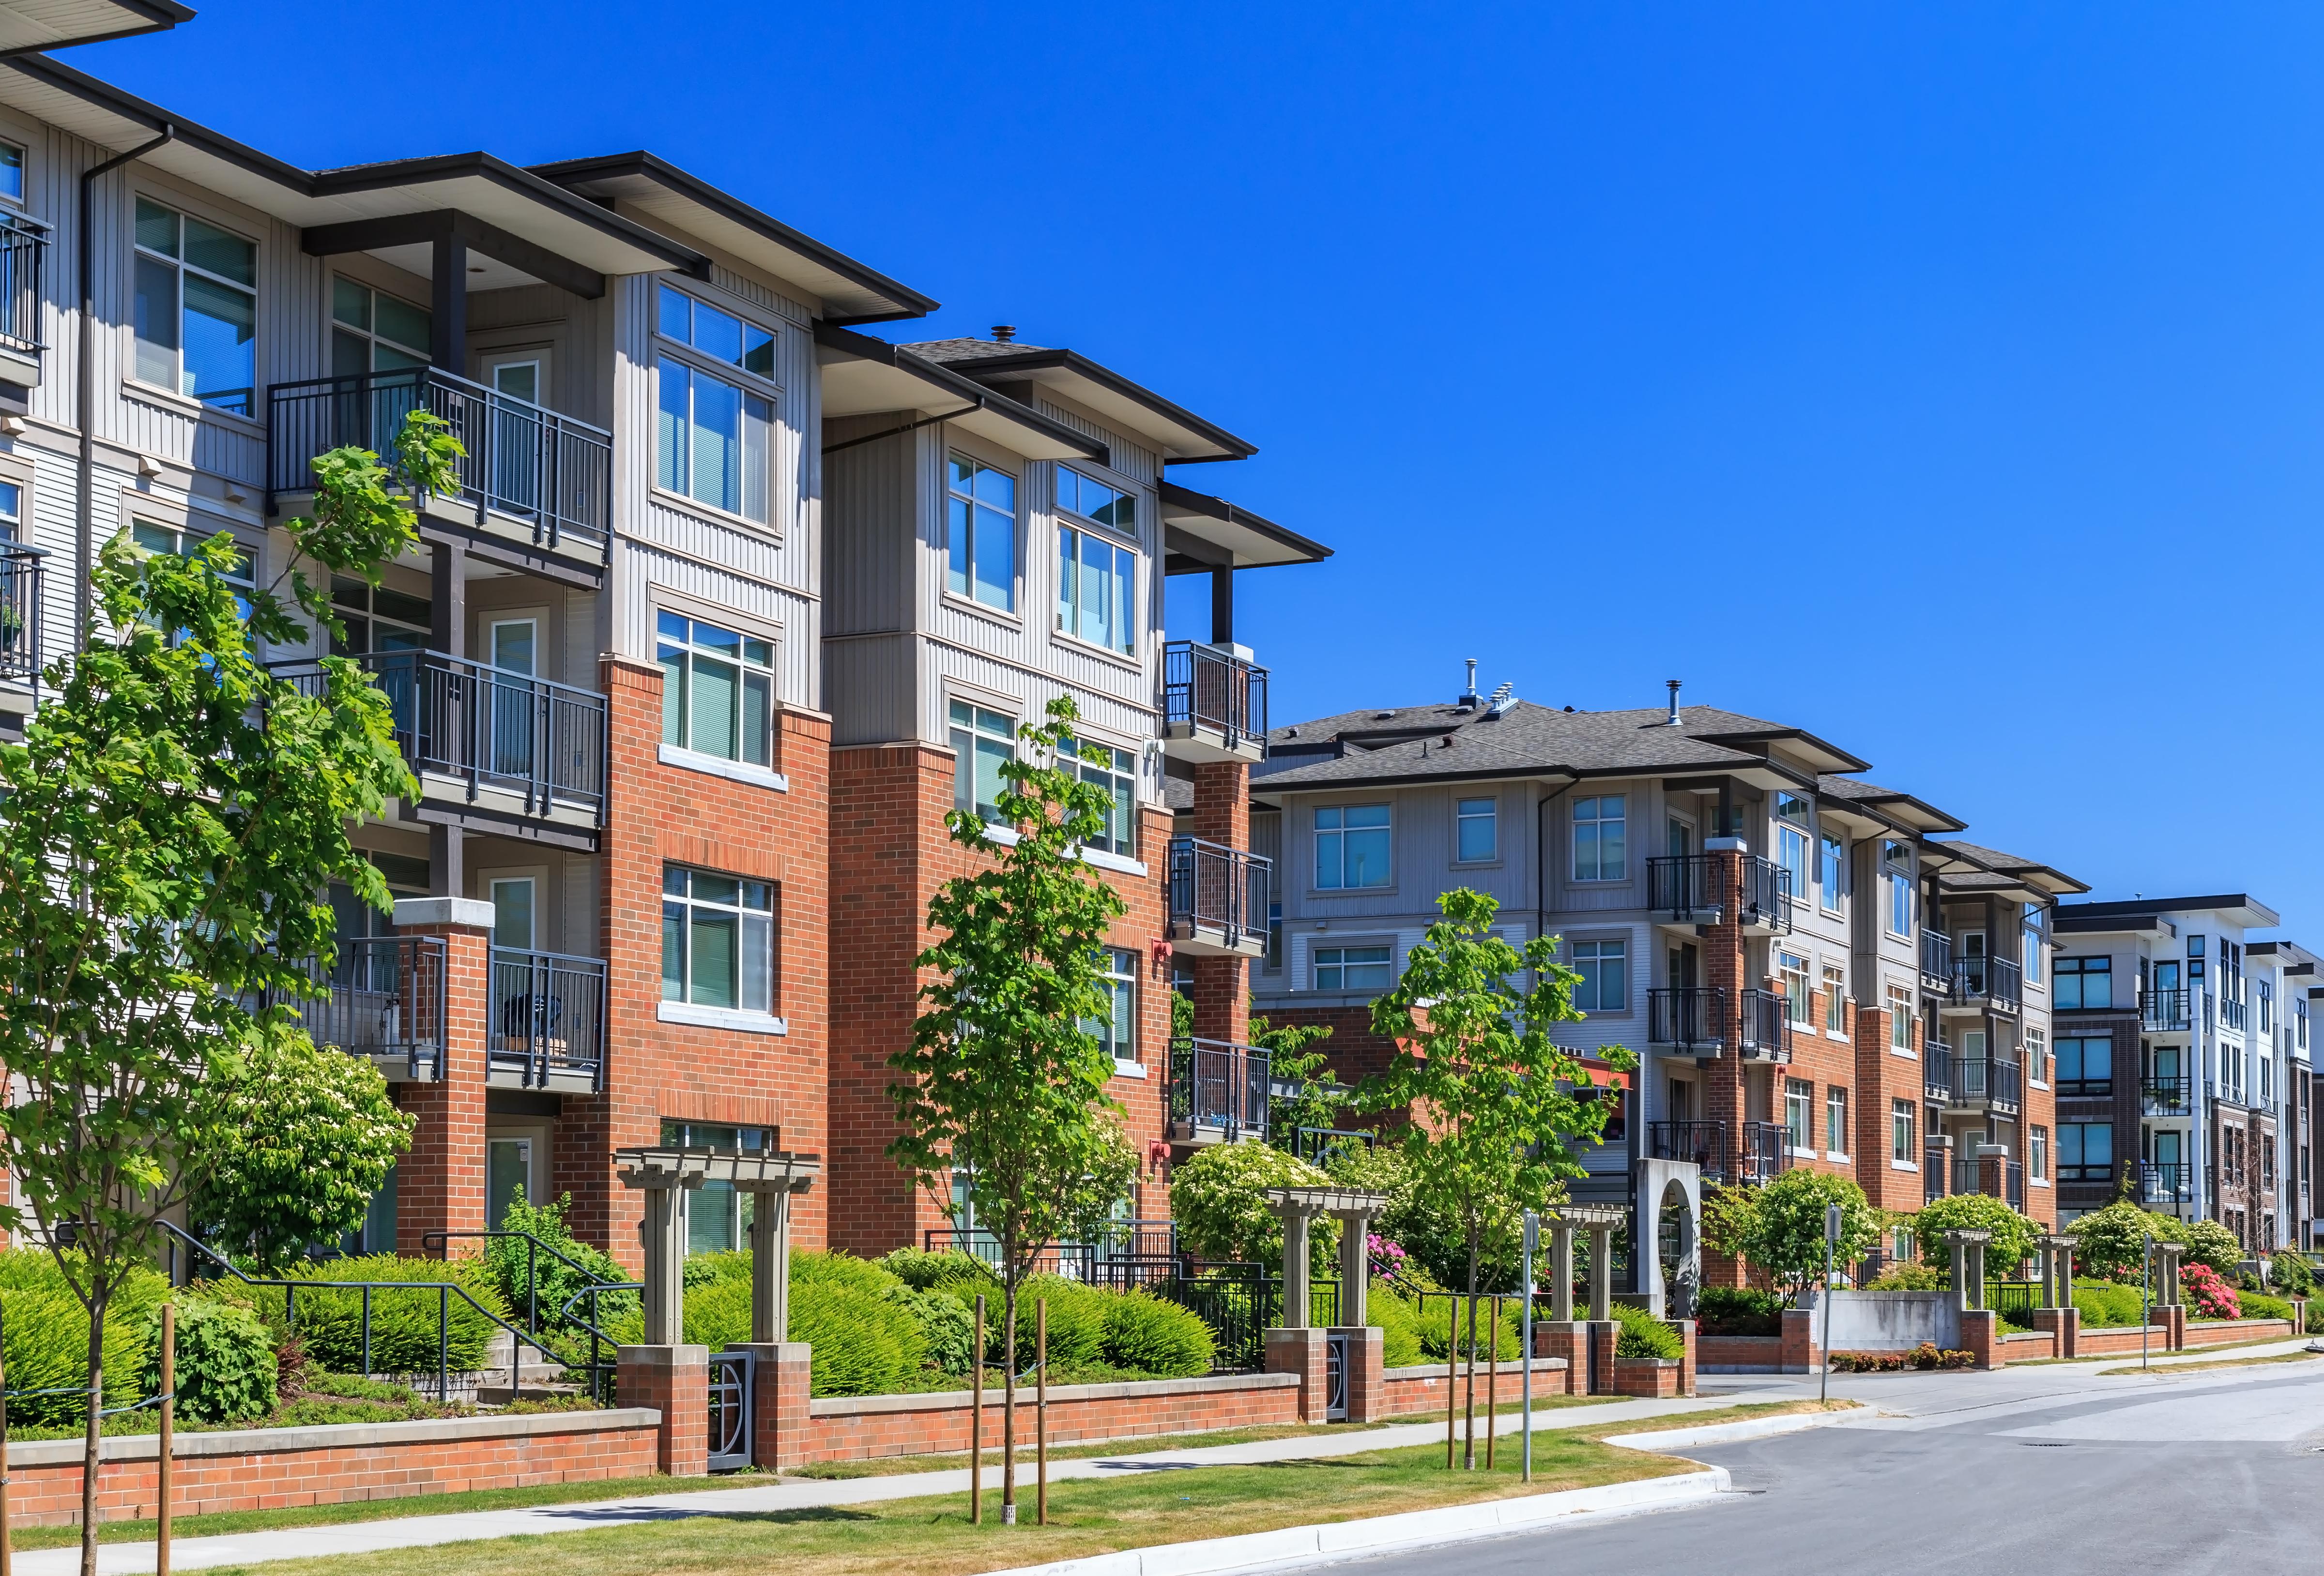 J&D Management reviews | Property Management at 4849 Ronson Ct - San Diego CA